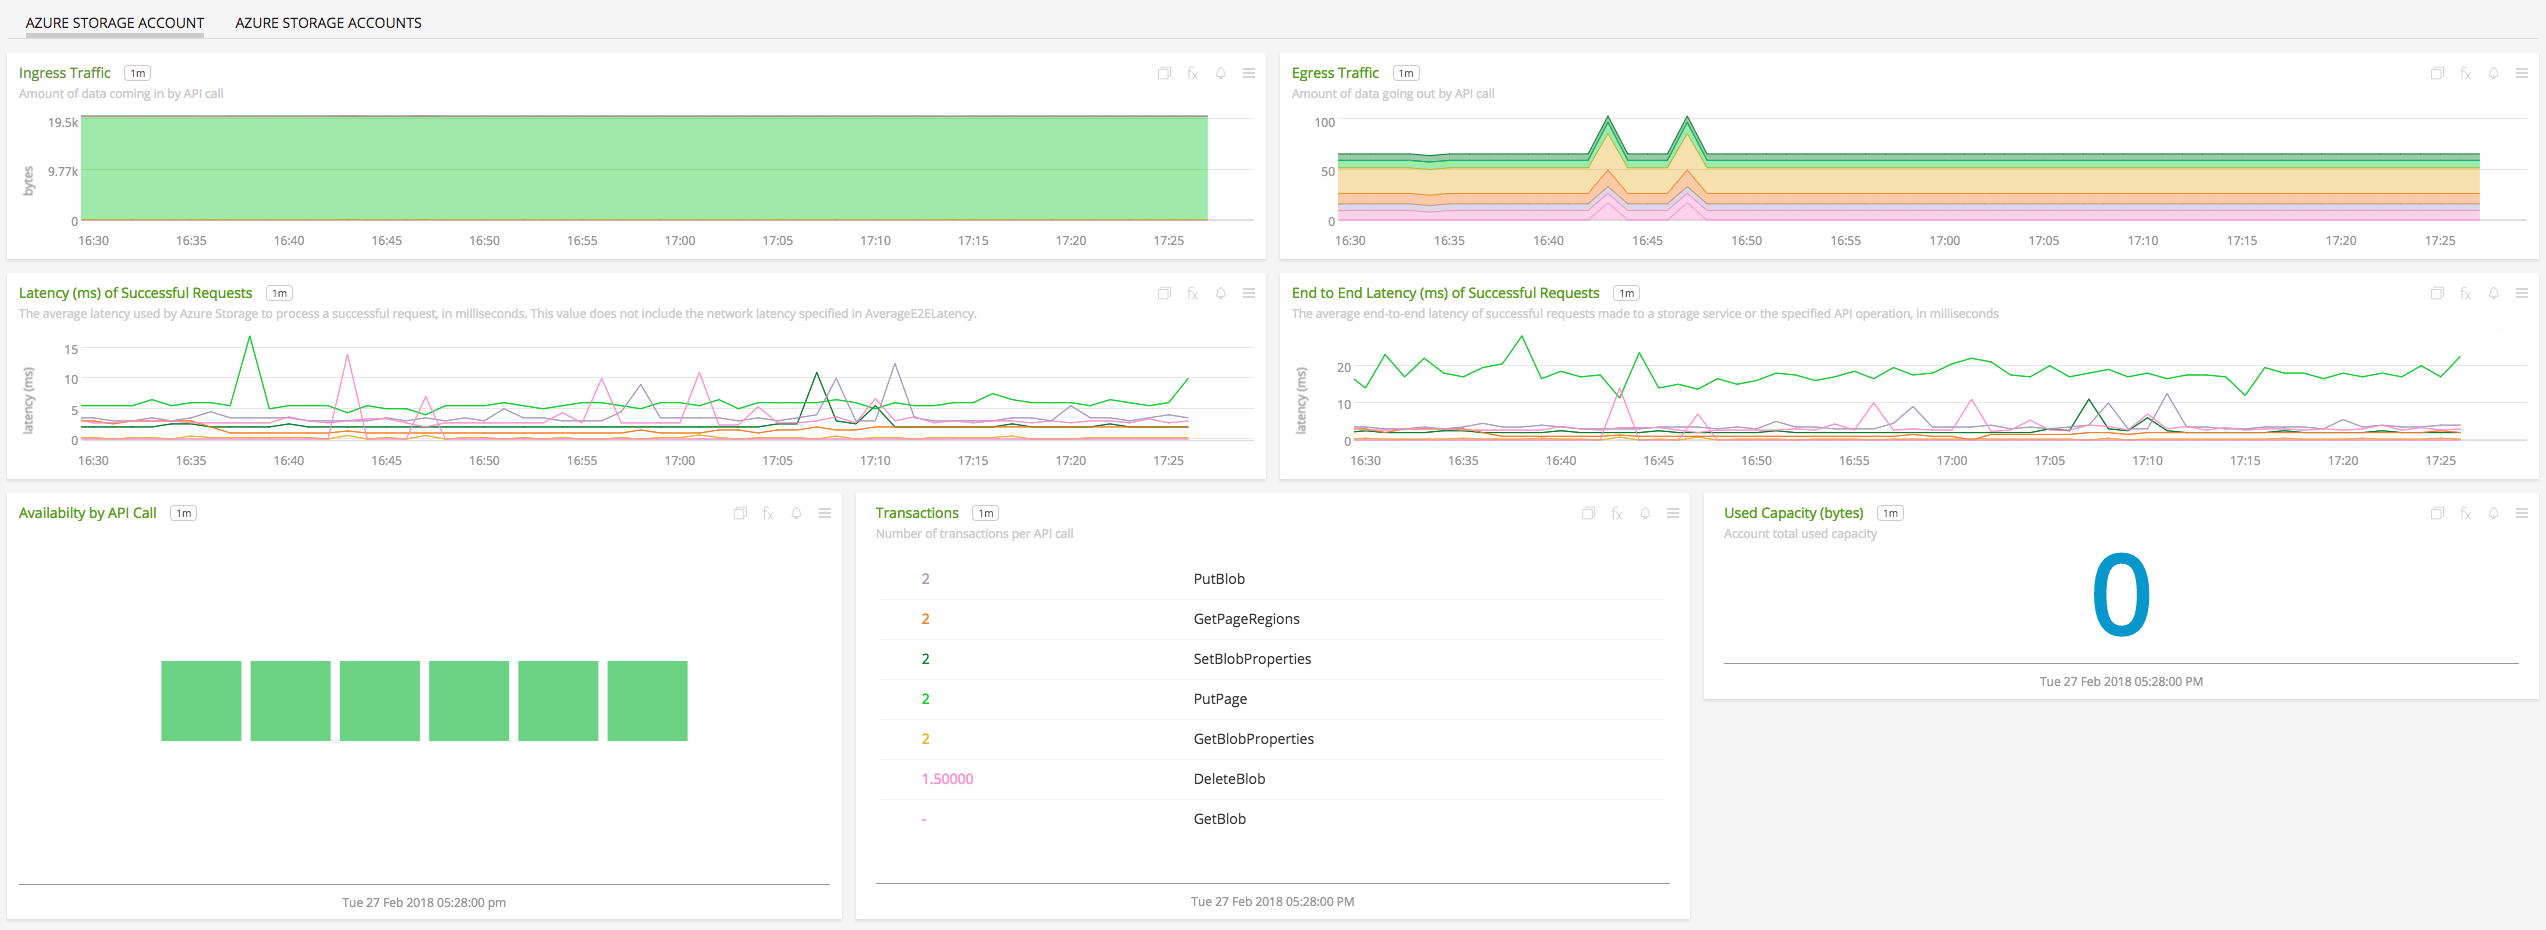 Microsoft Azure Storage — SignalFx documentation